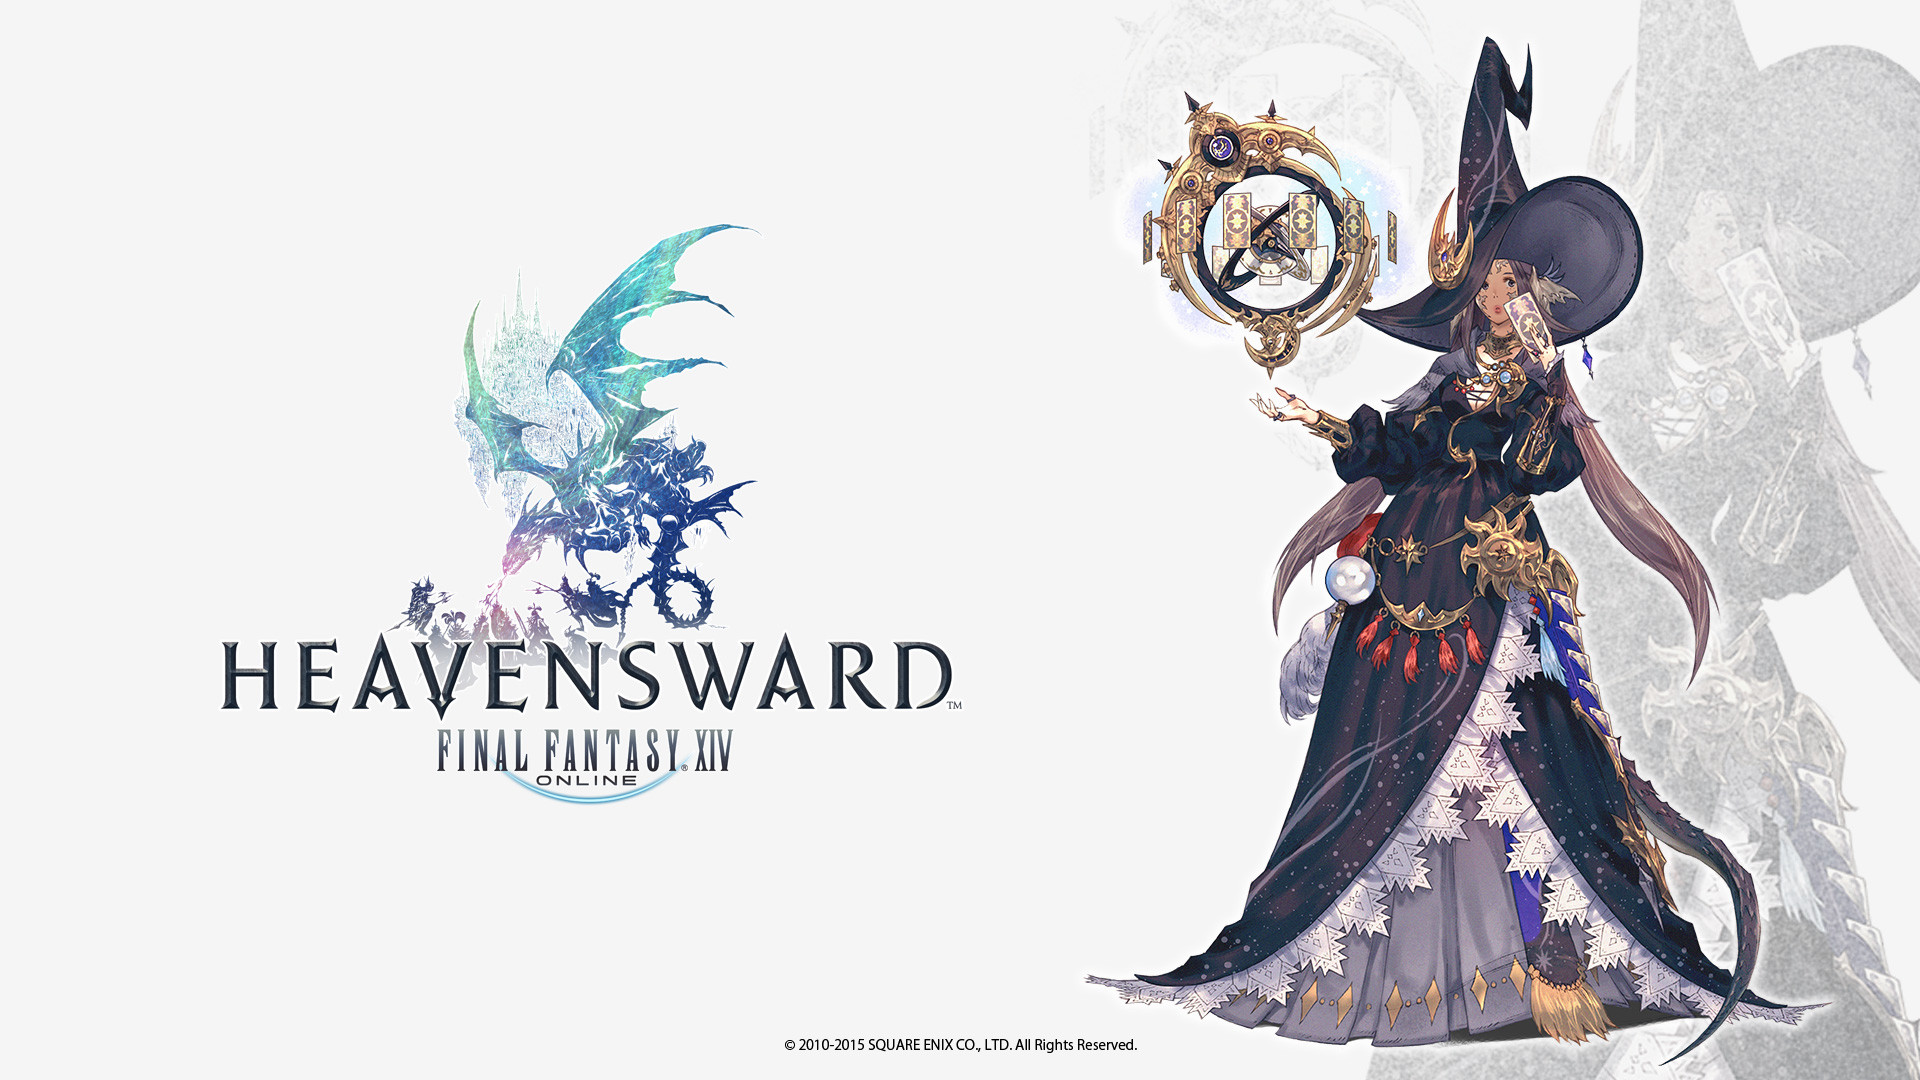 … final fantasy xiv heavensward hd wallpapers 9 cly wallpapers hd …